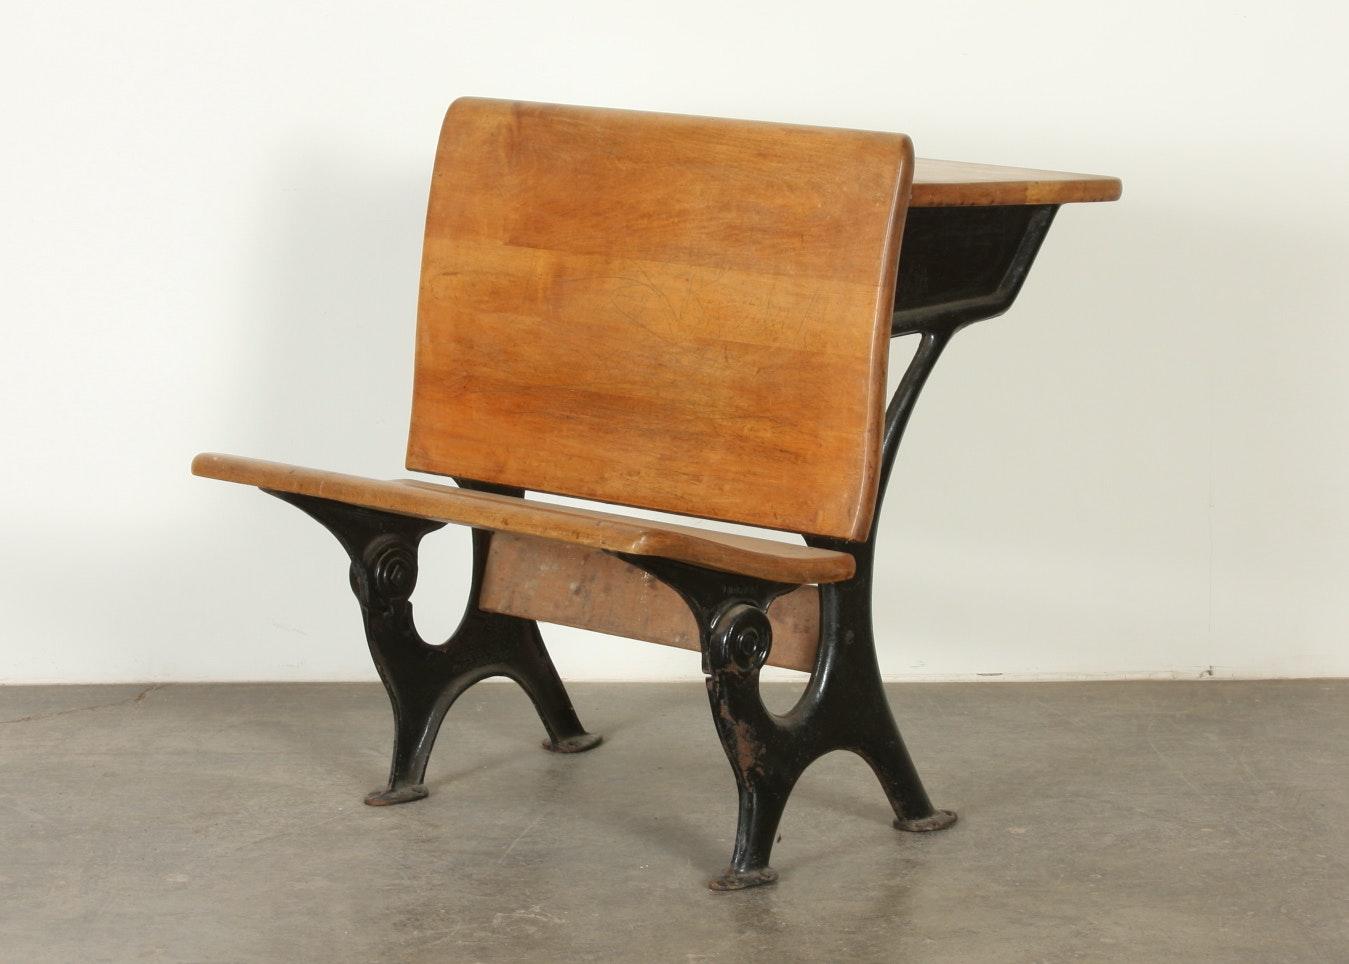 A Theodor Kundtz Eclipse Antique School Desk #6, ...